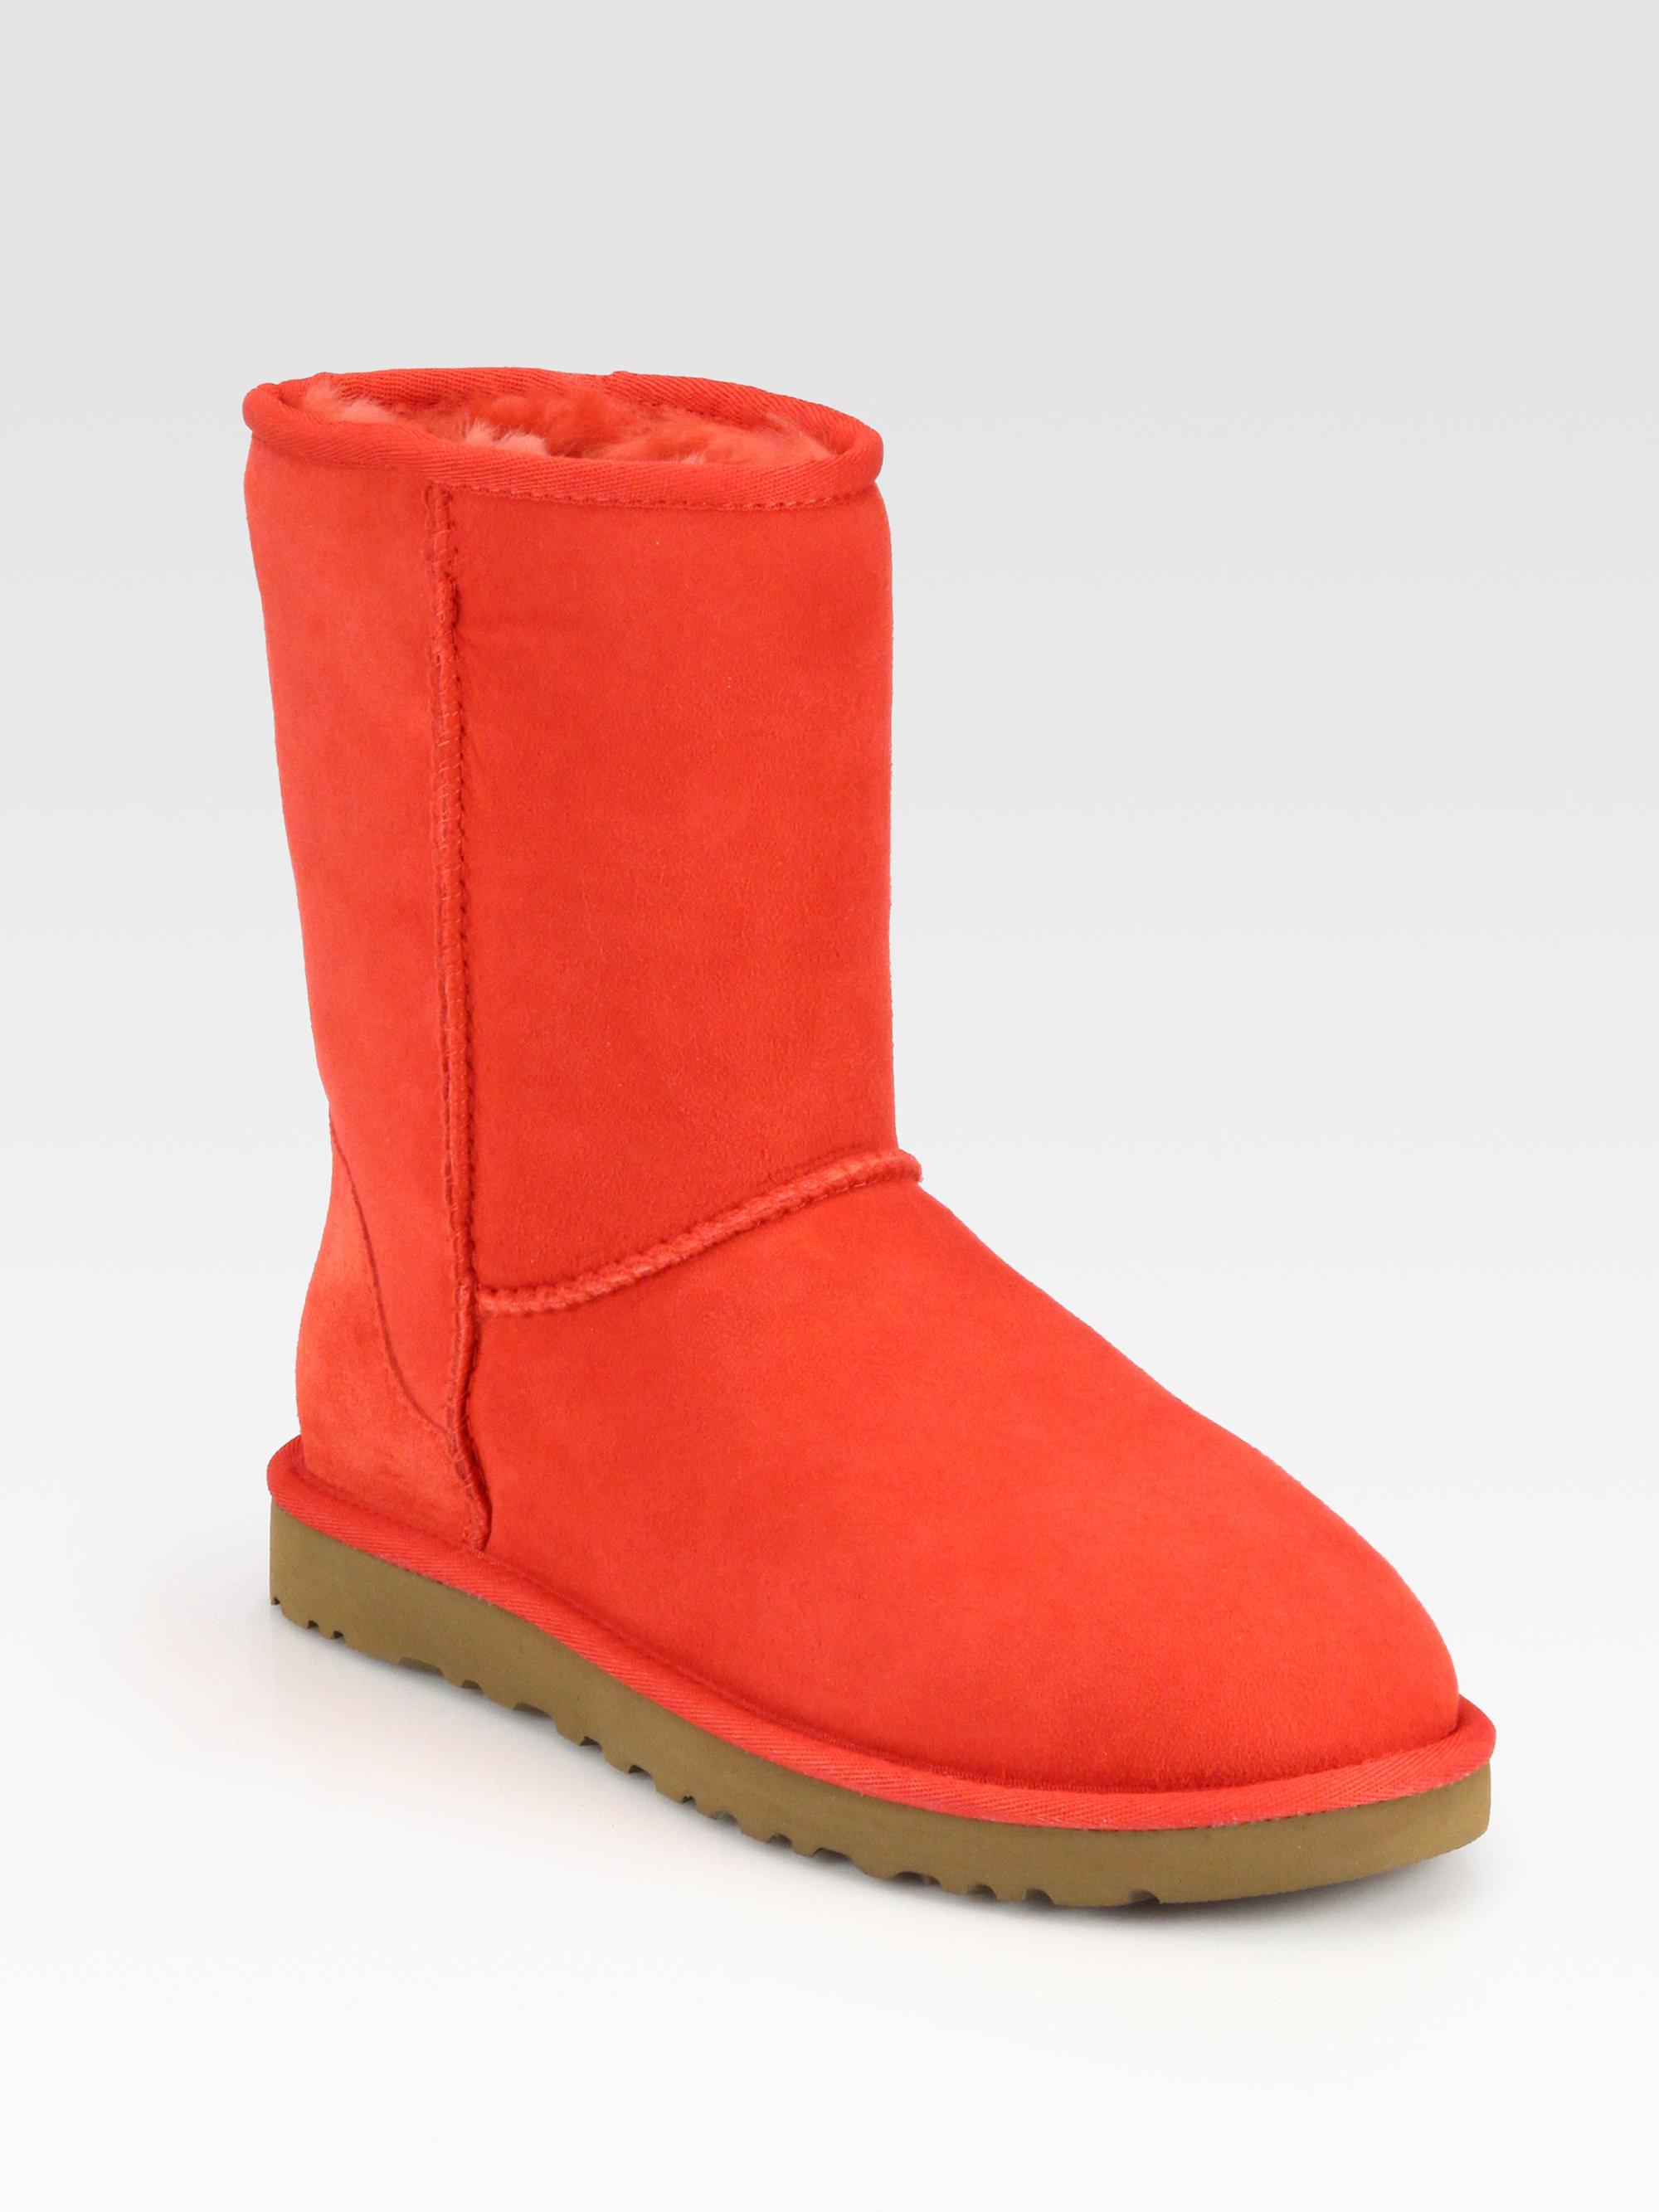 Ugg Classic Short Sheepskin Boots Lyst